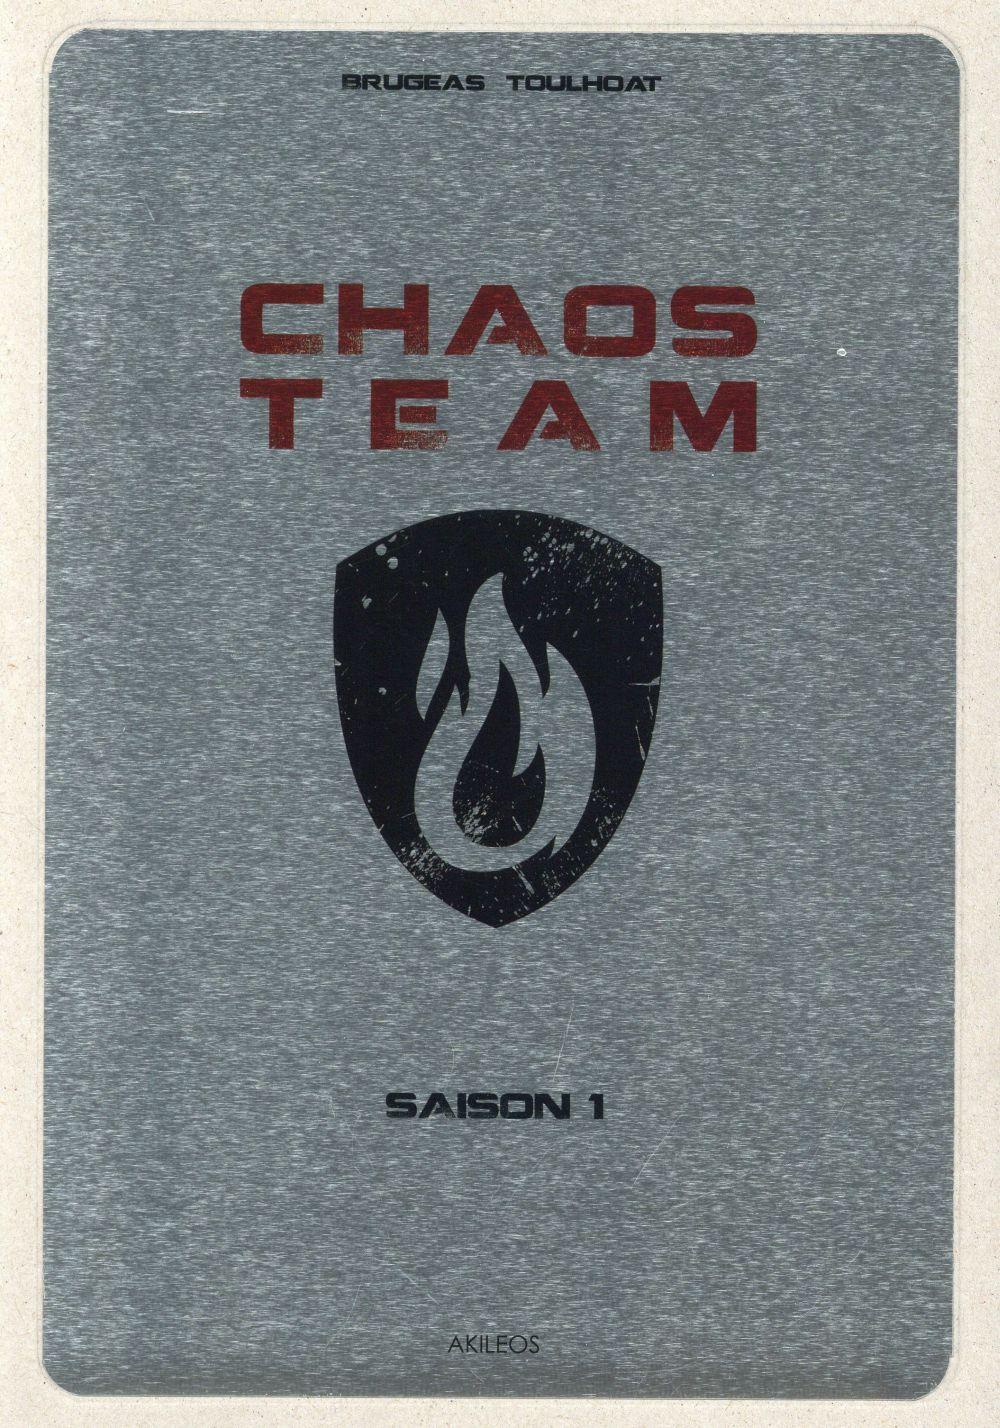 CHAOS TEAM - INTEGRALE SAISON 1